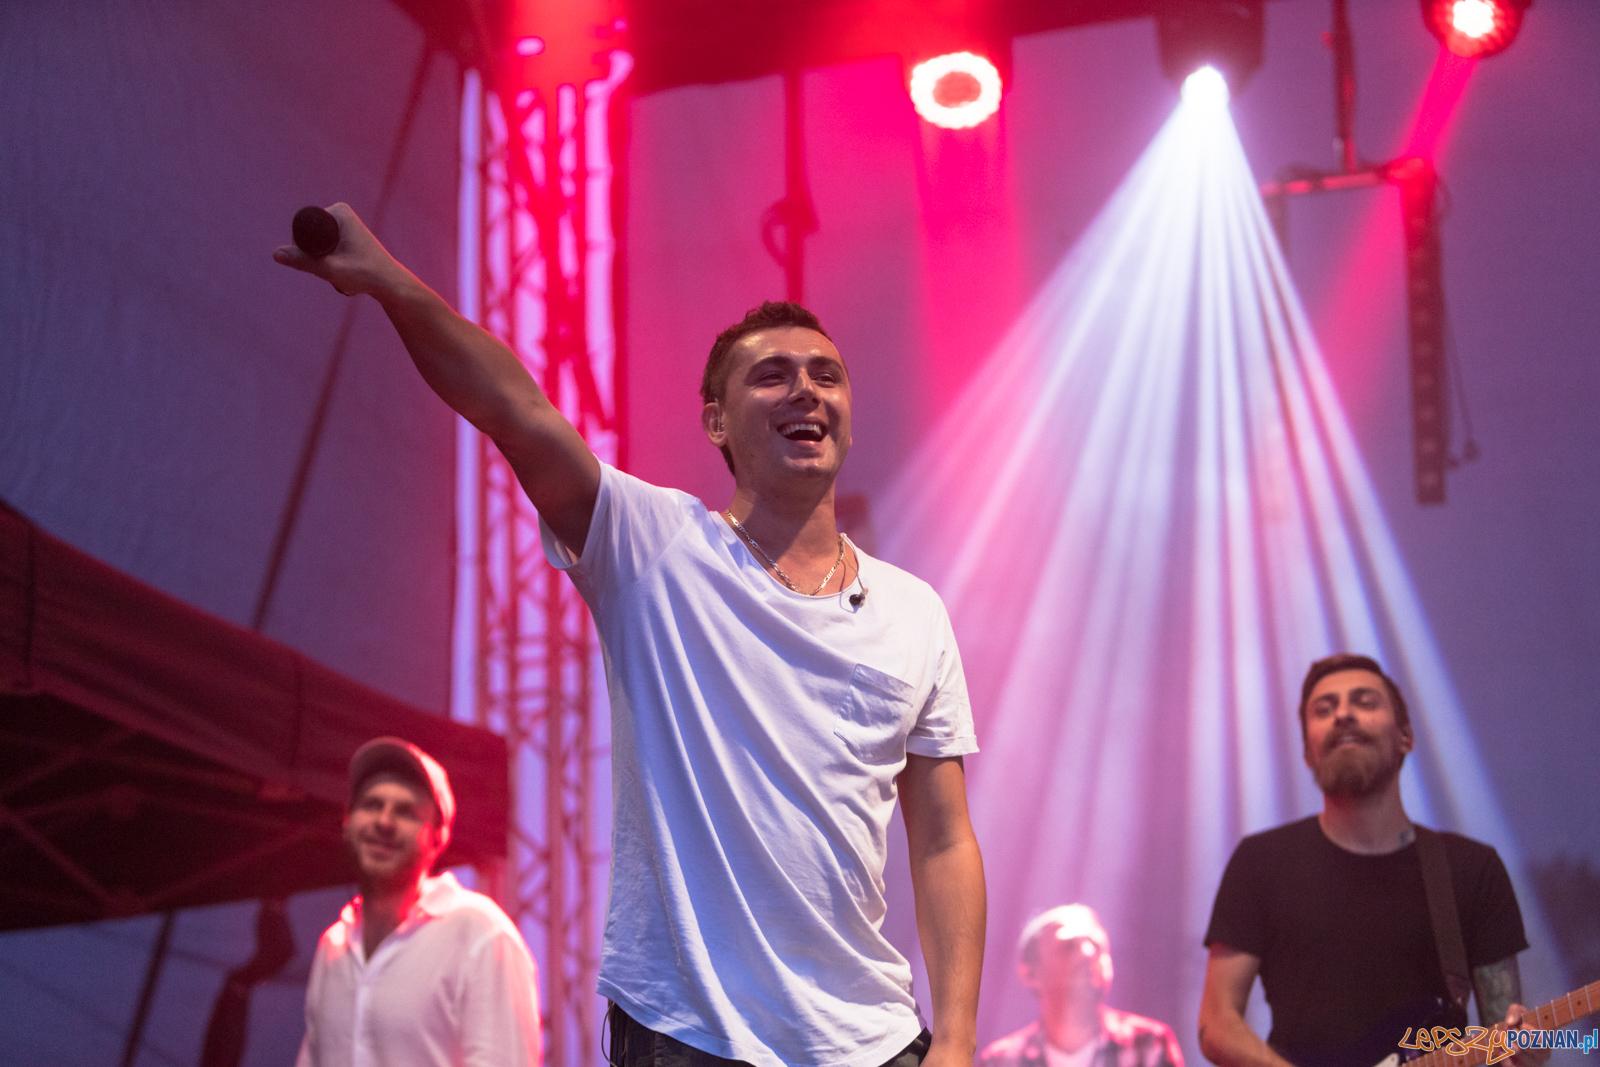 #NaFalach Kamil Bednarek